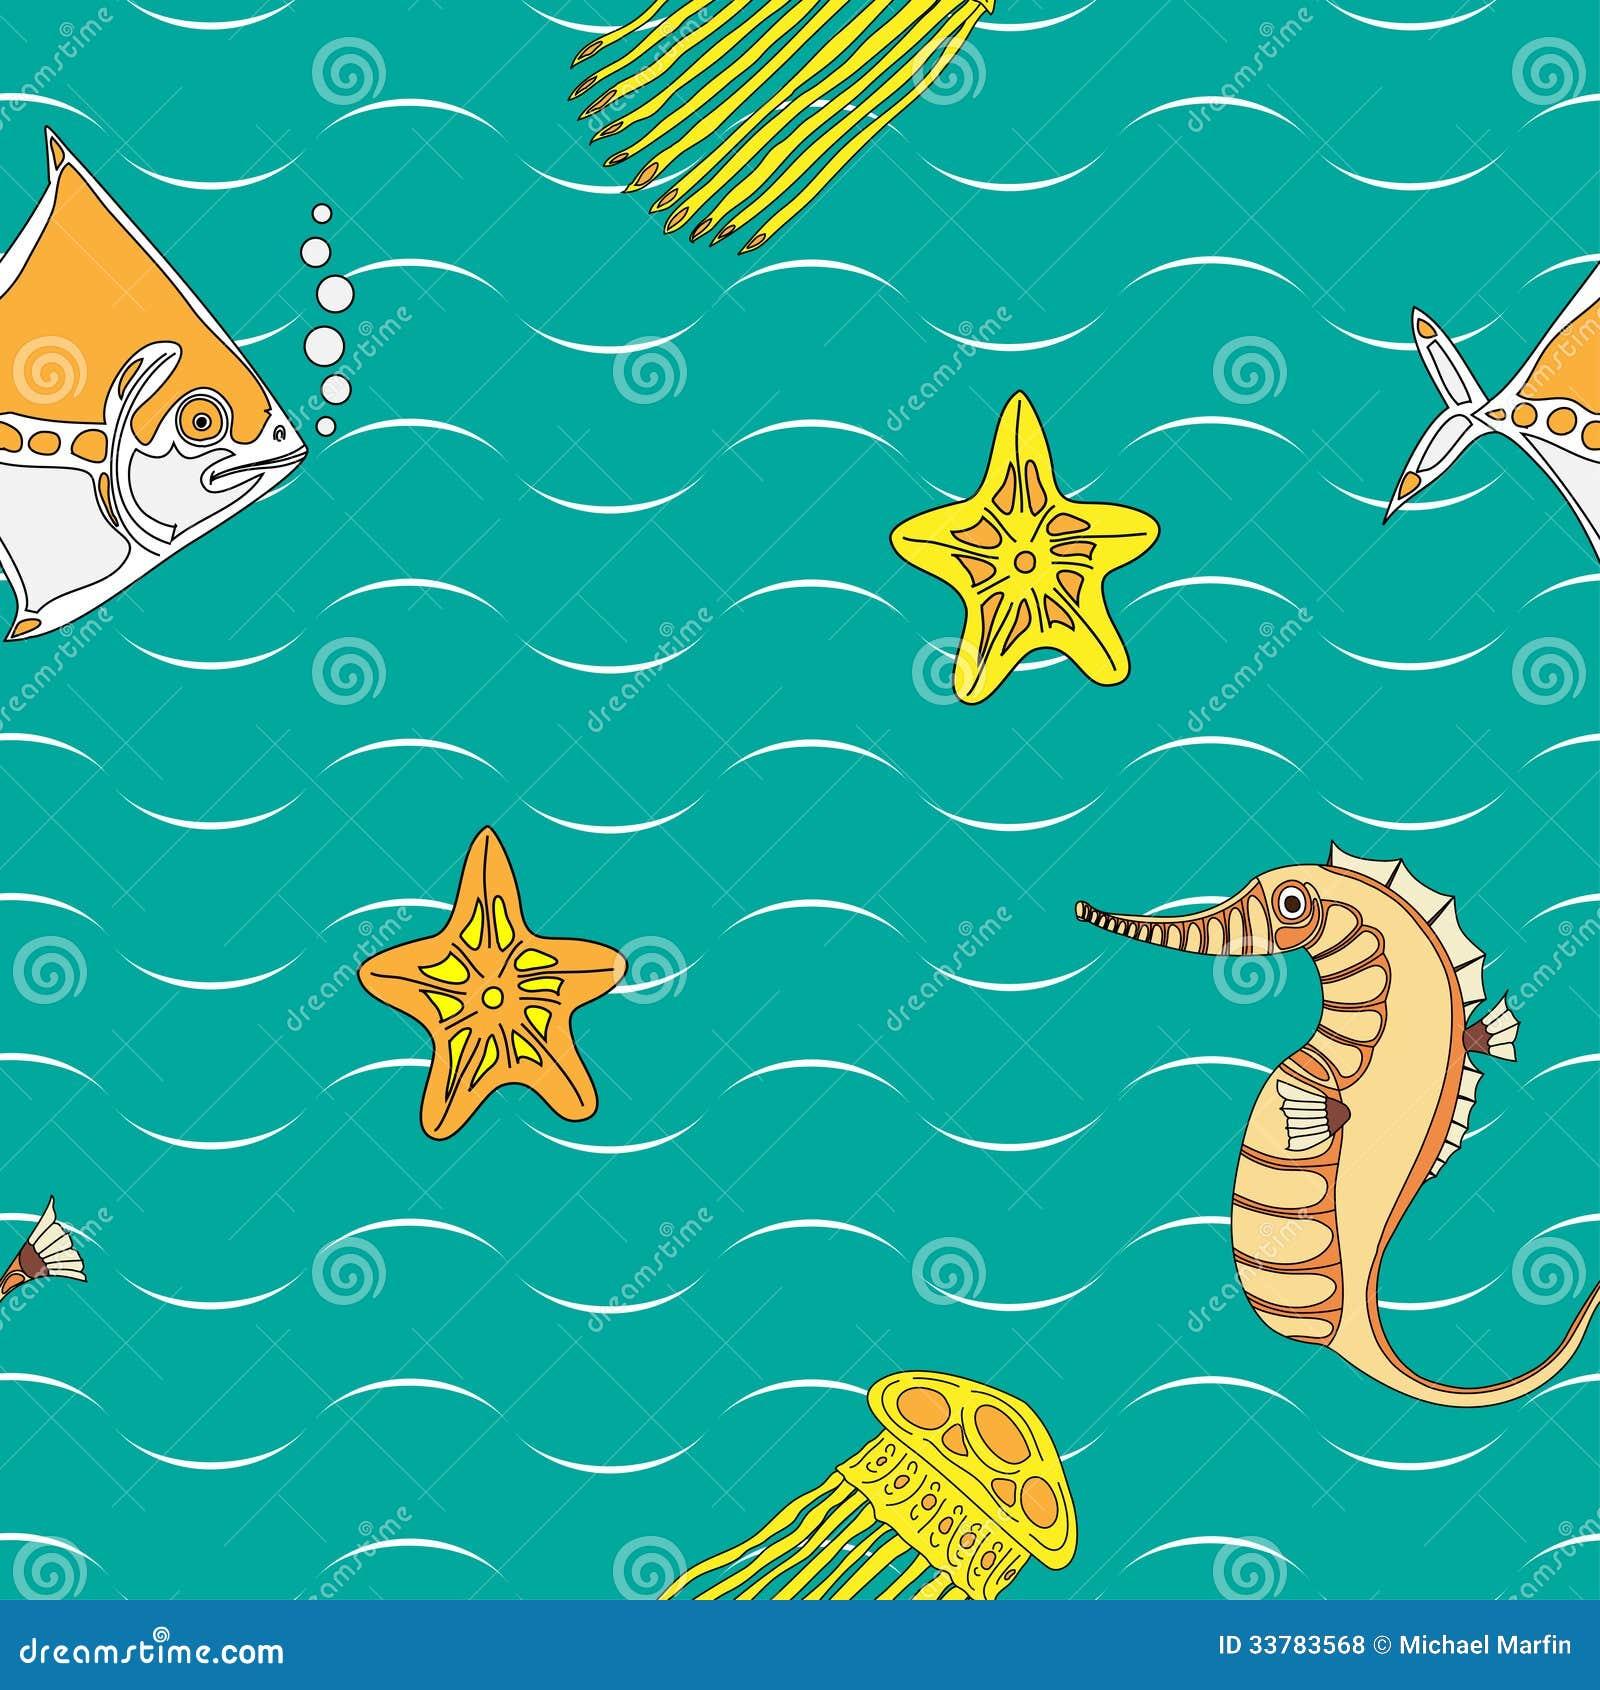 Безшовная картина с жителями моря